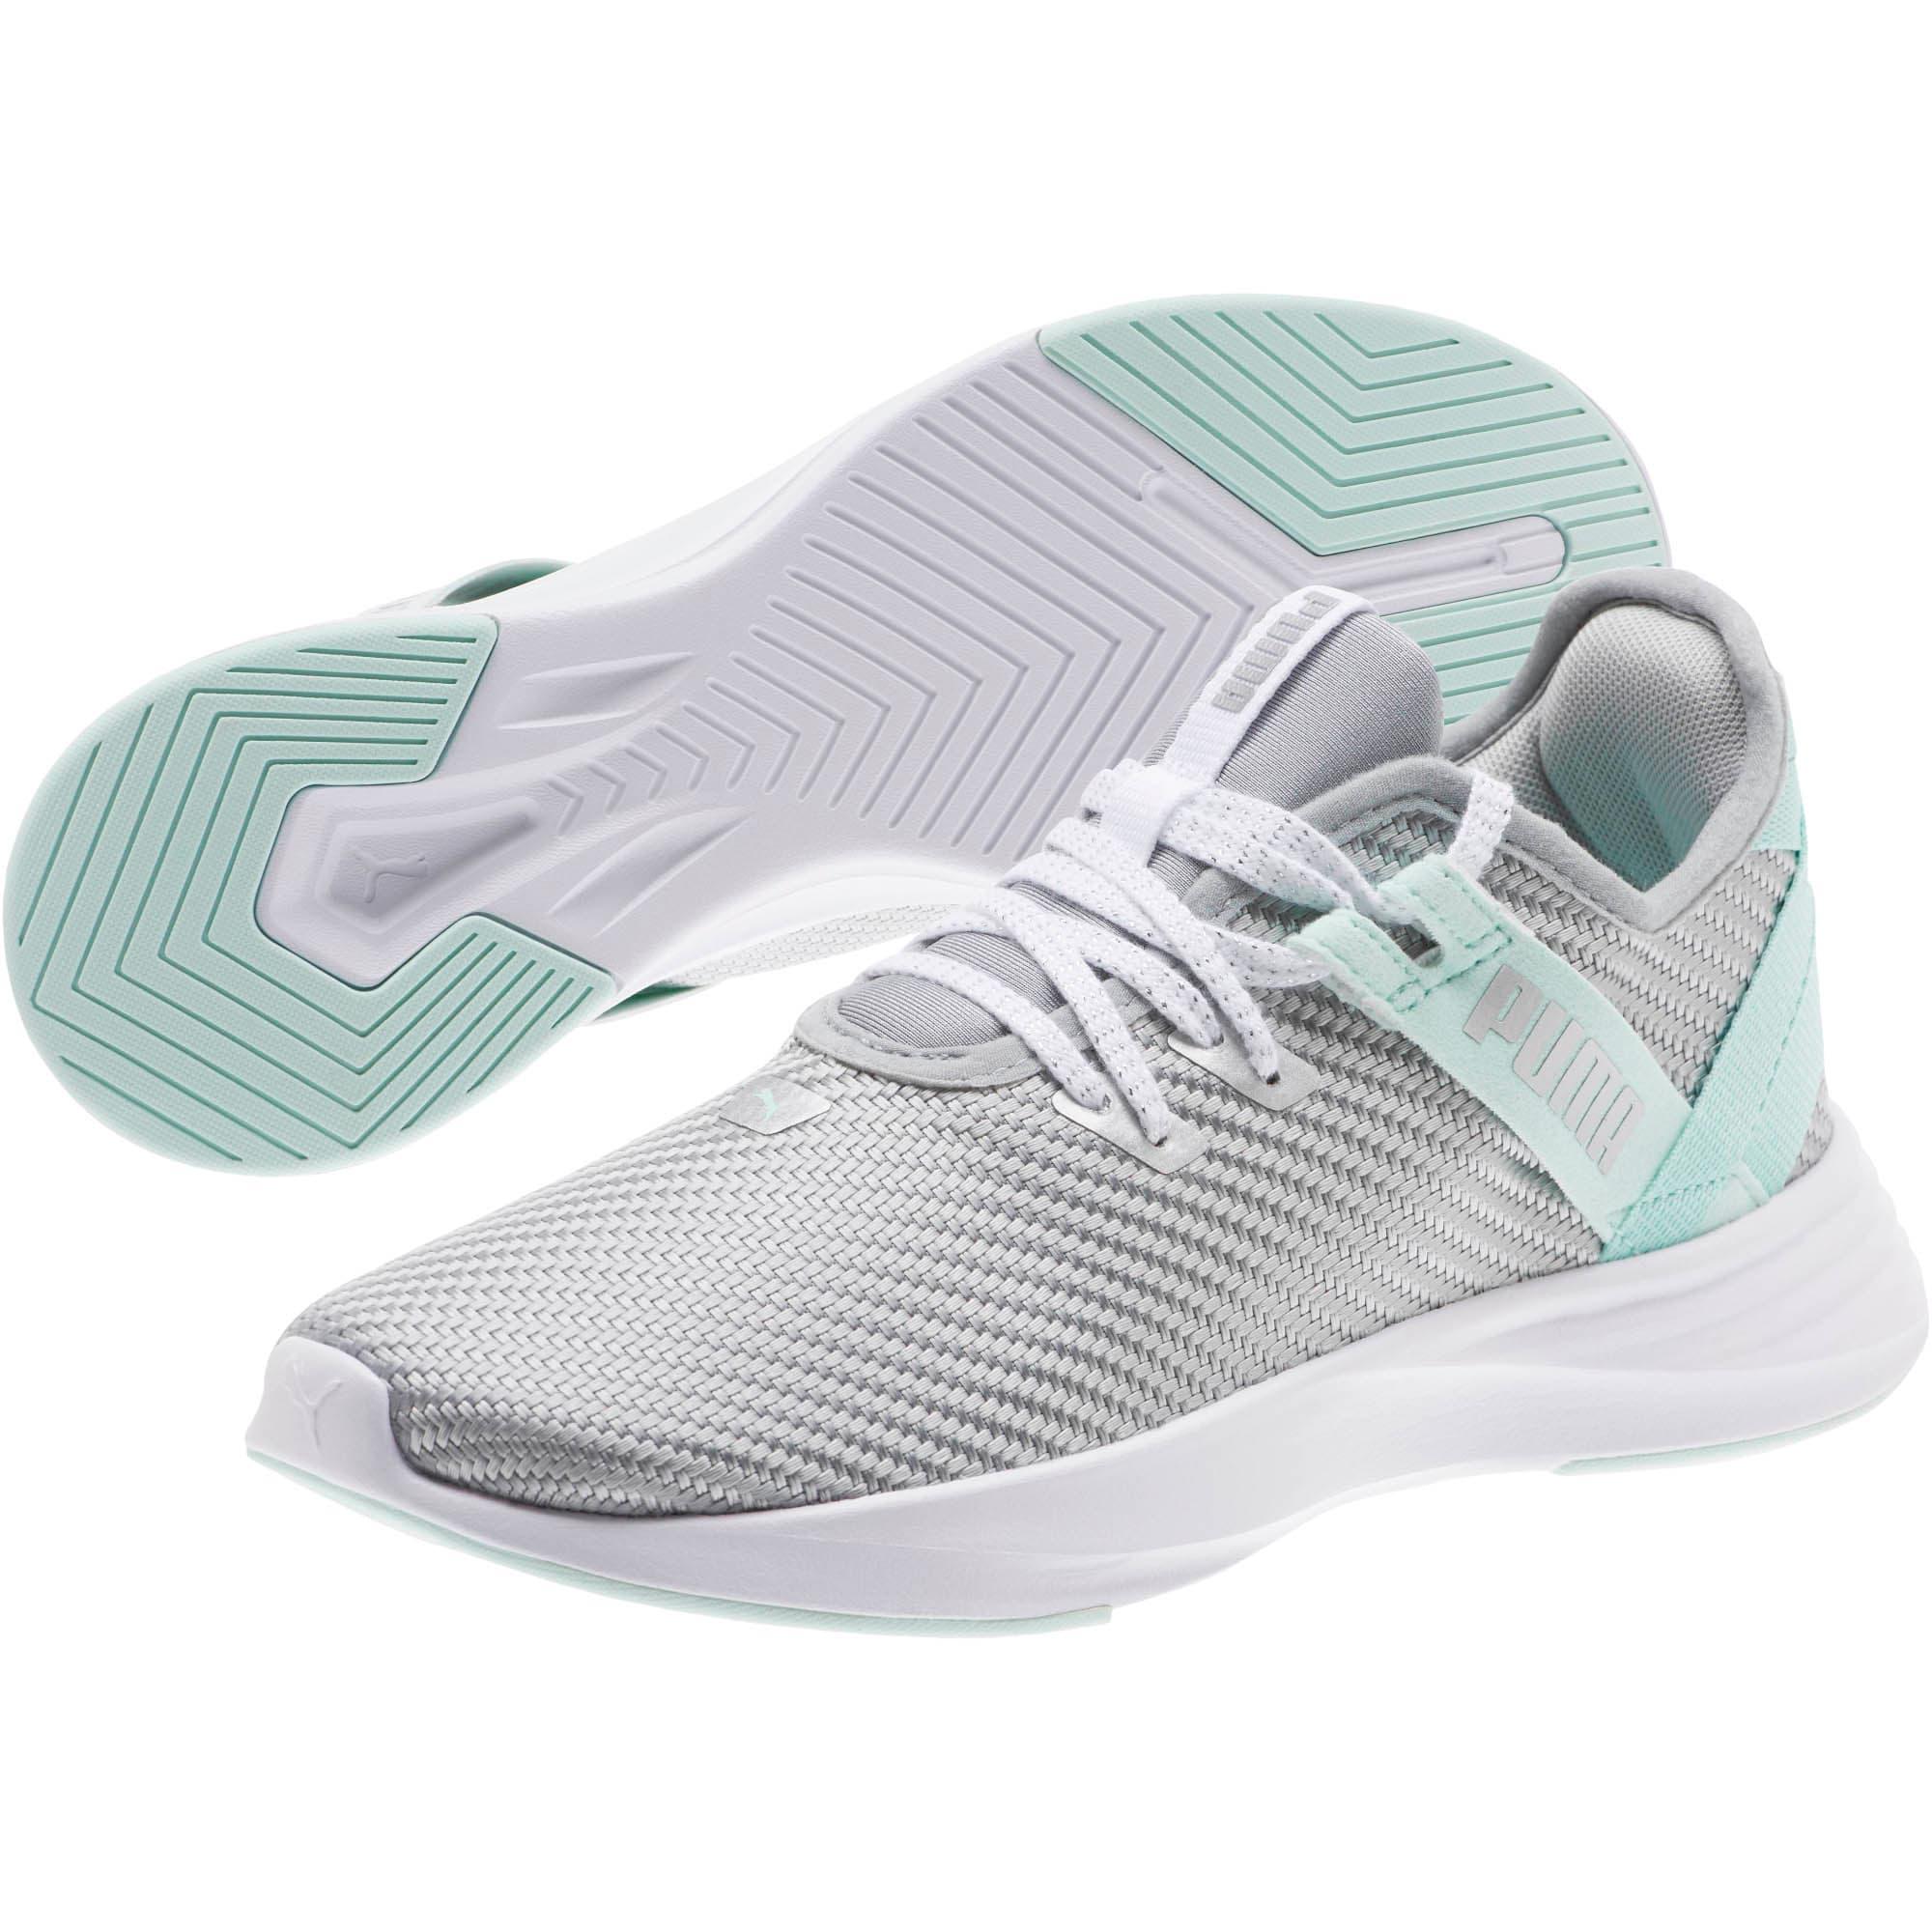 Thumbnail 2 of Radiate XT Cosmic Women's Training Shoes, Puma Silver-Fair Aqua, medium